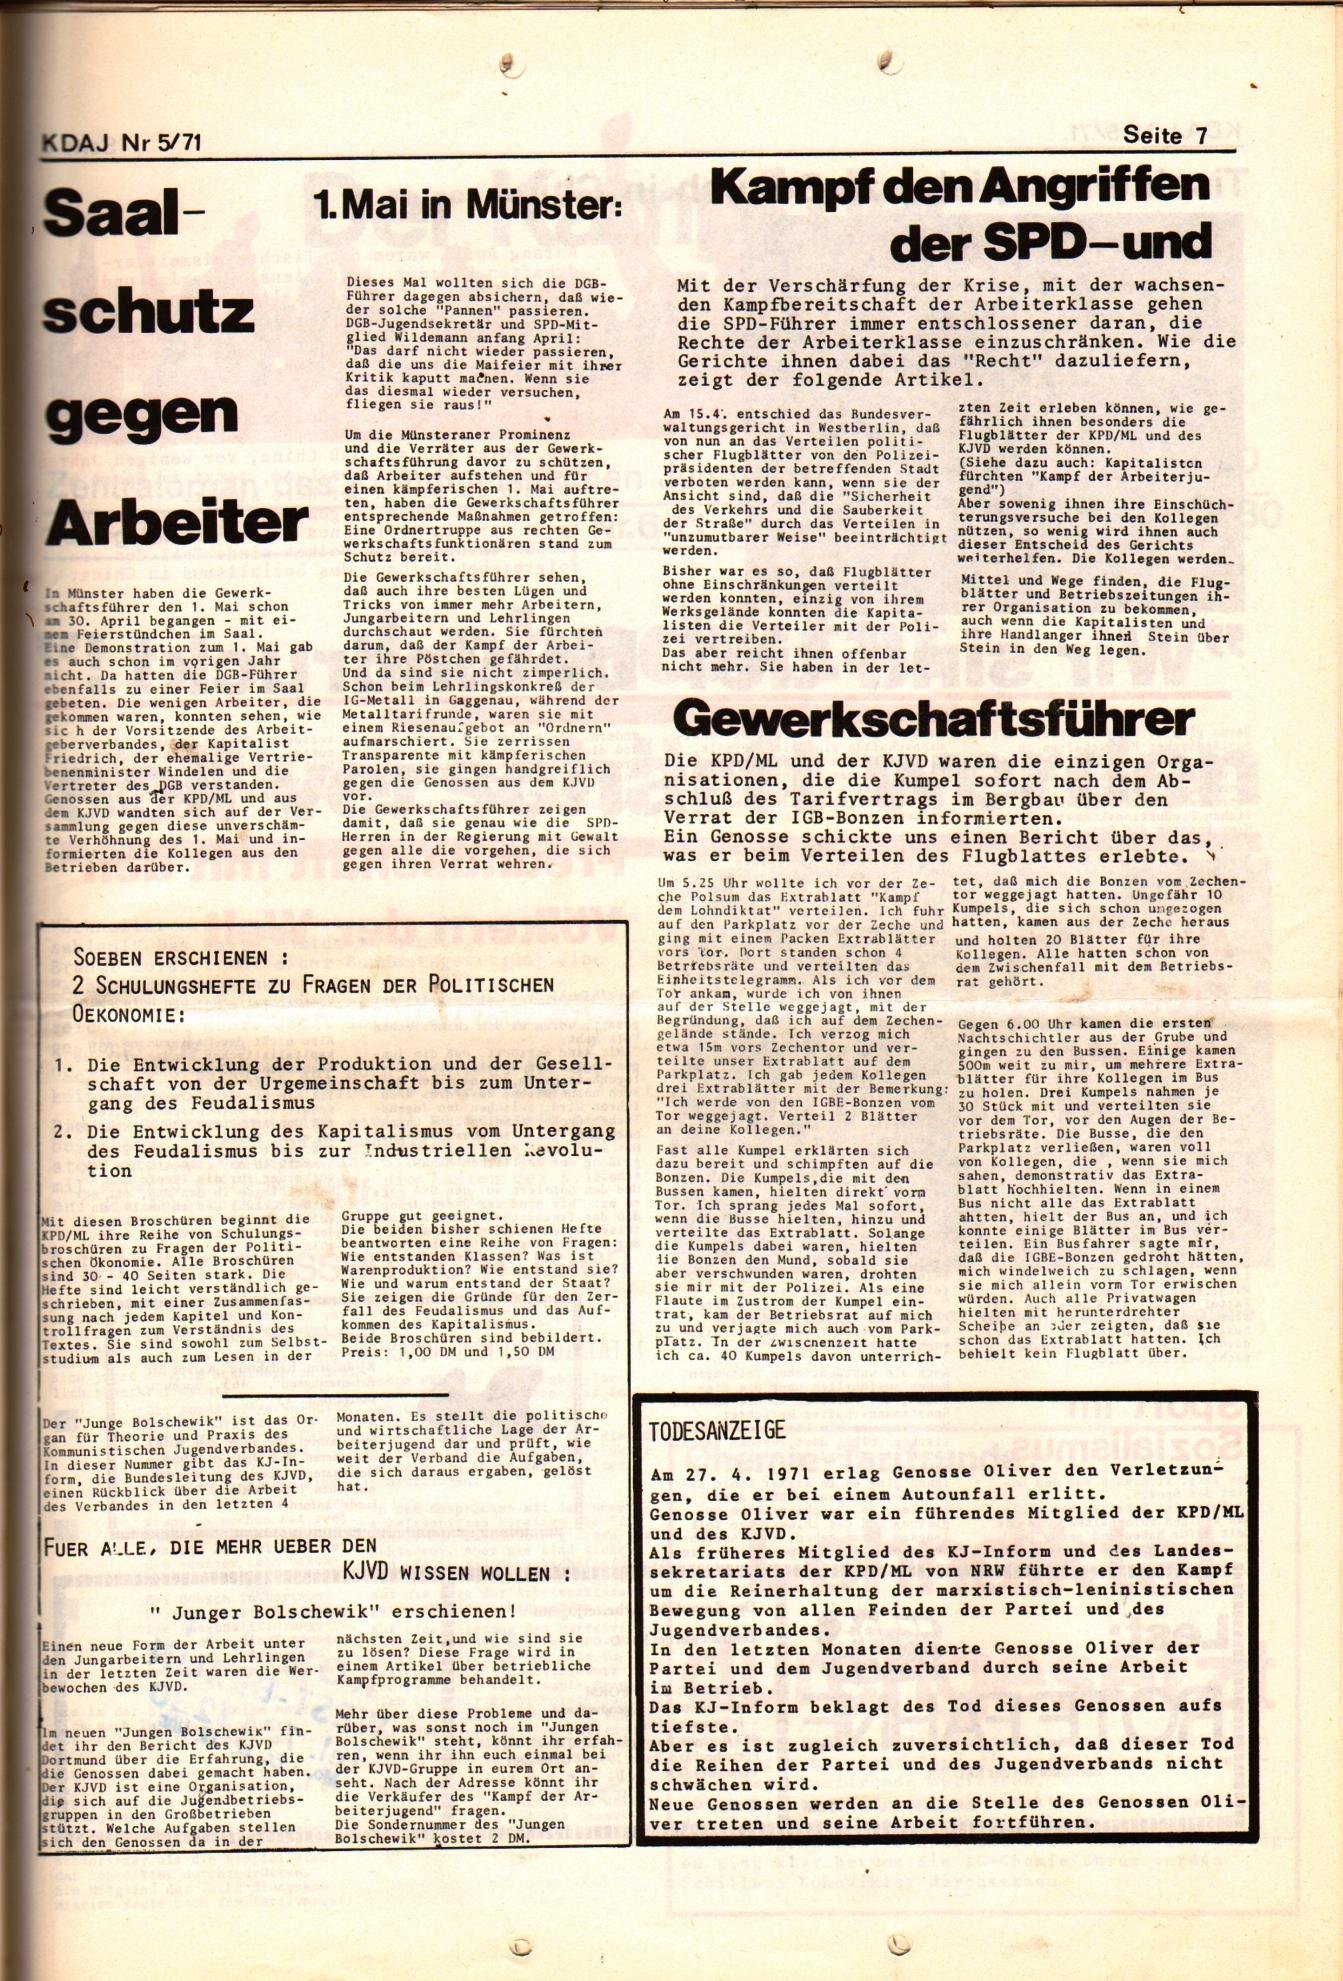 KDAJ, 2. Jg., Mai 1971, Nr. 5, Seite 7